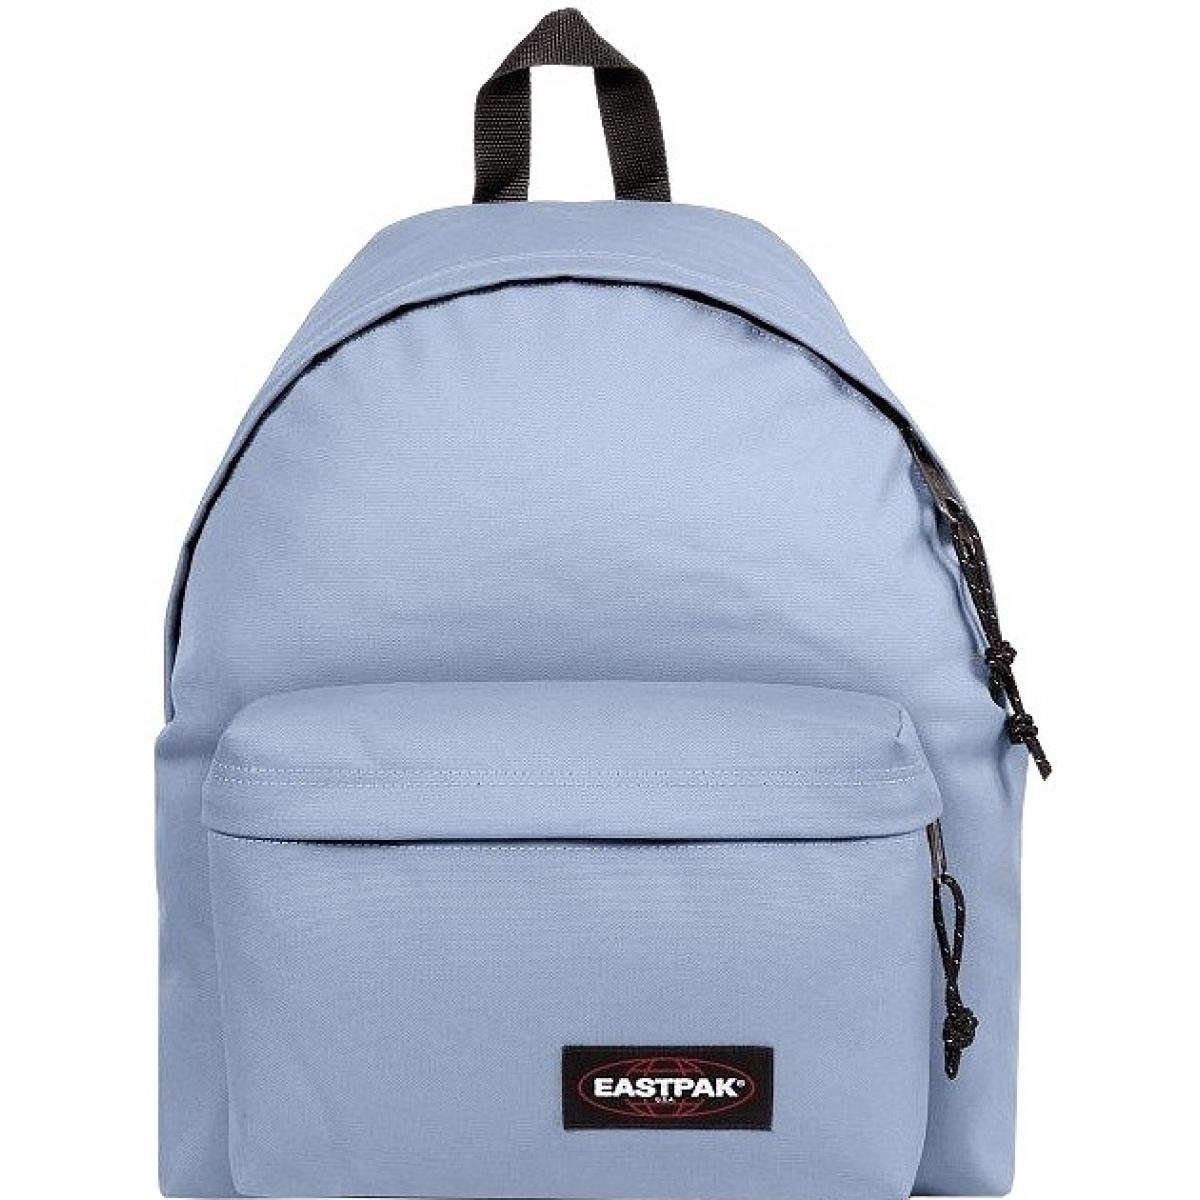 sac dos scolaire eastpak ek620 delicate lilac ek62059s couleur principale assortis. Black Bedroom Furniture Sets. Home Design Ideas